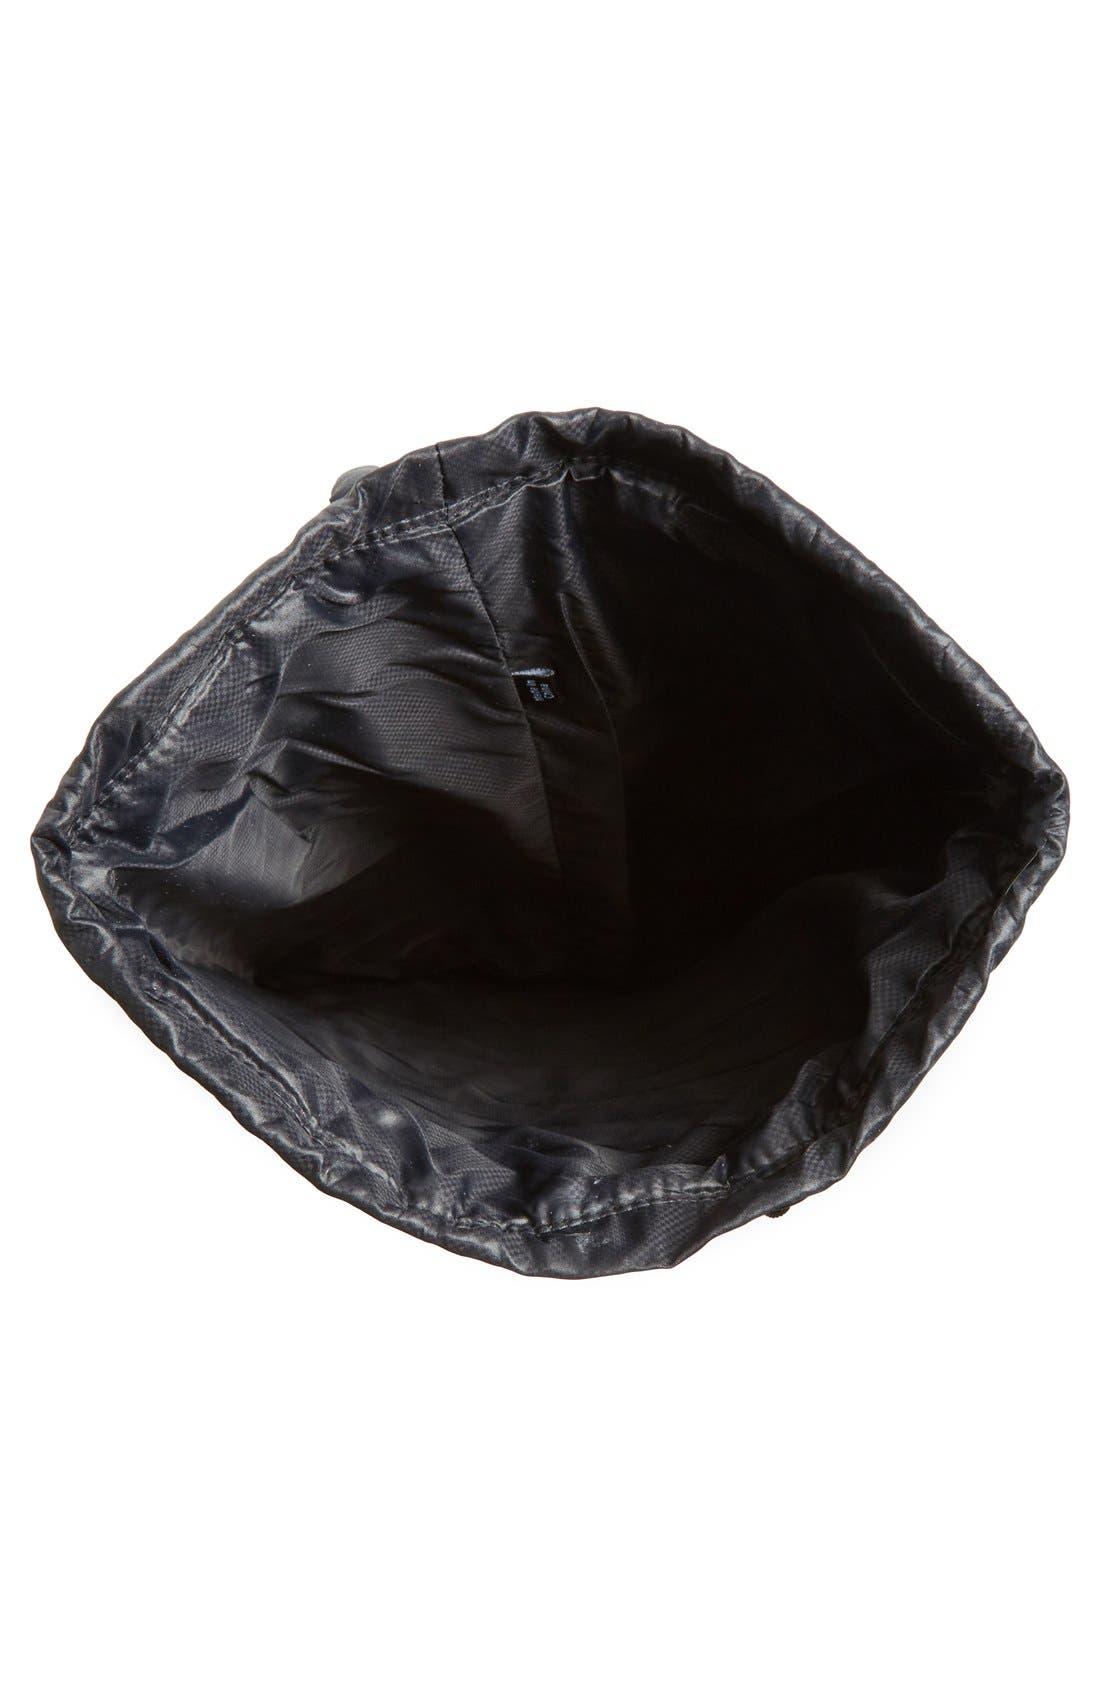 Yoga Mat Bag,                             Alternate thumbnail 10, color,                             001